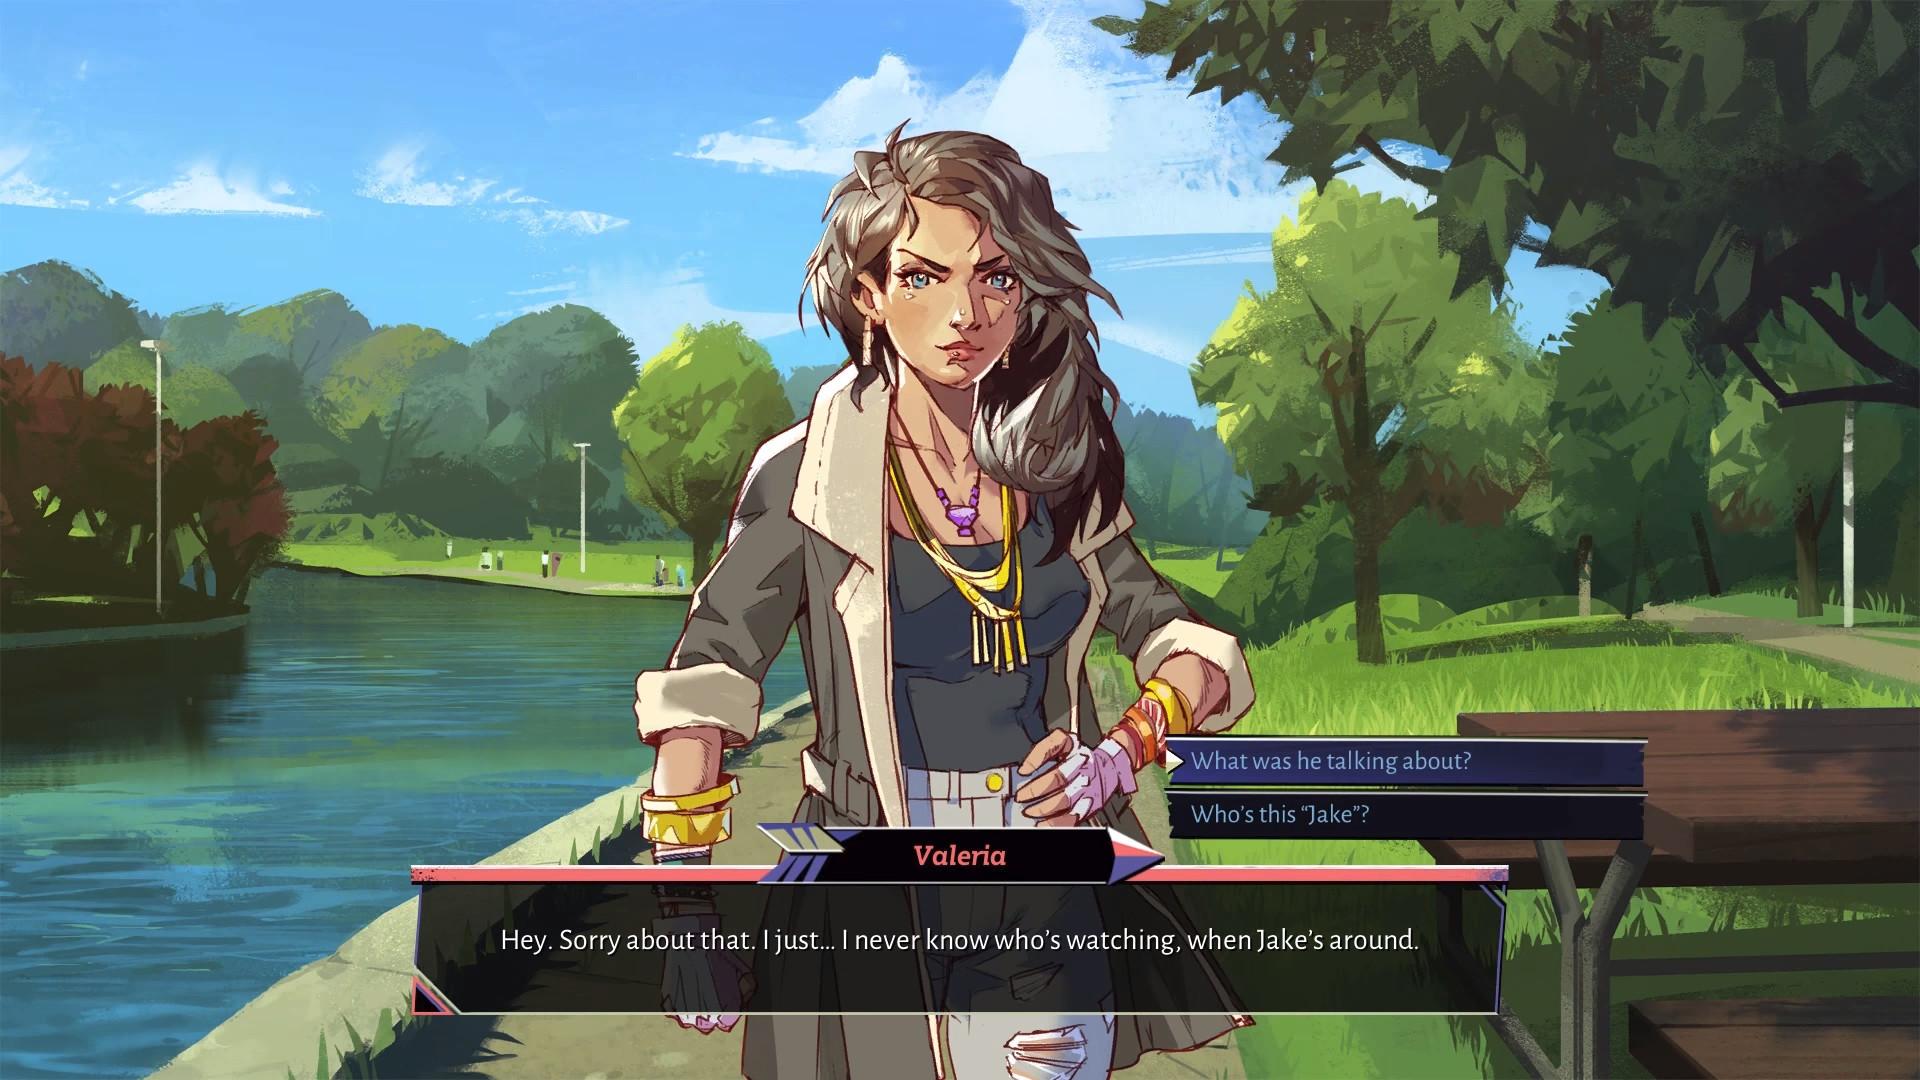 Captura de pantalla de Boyfriend Dungeon.